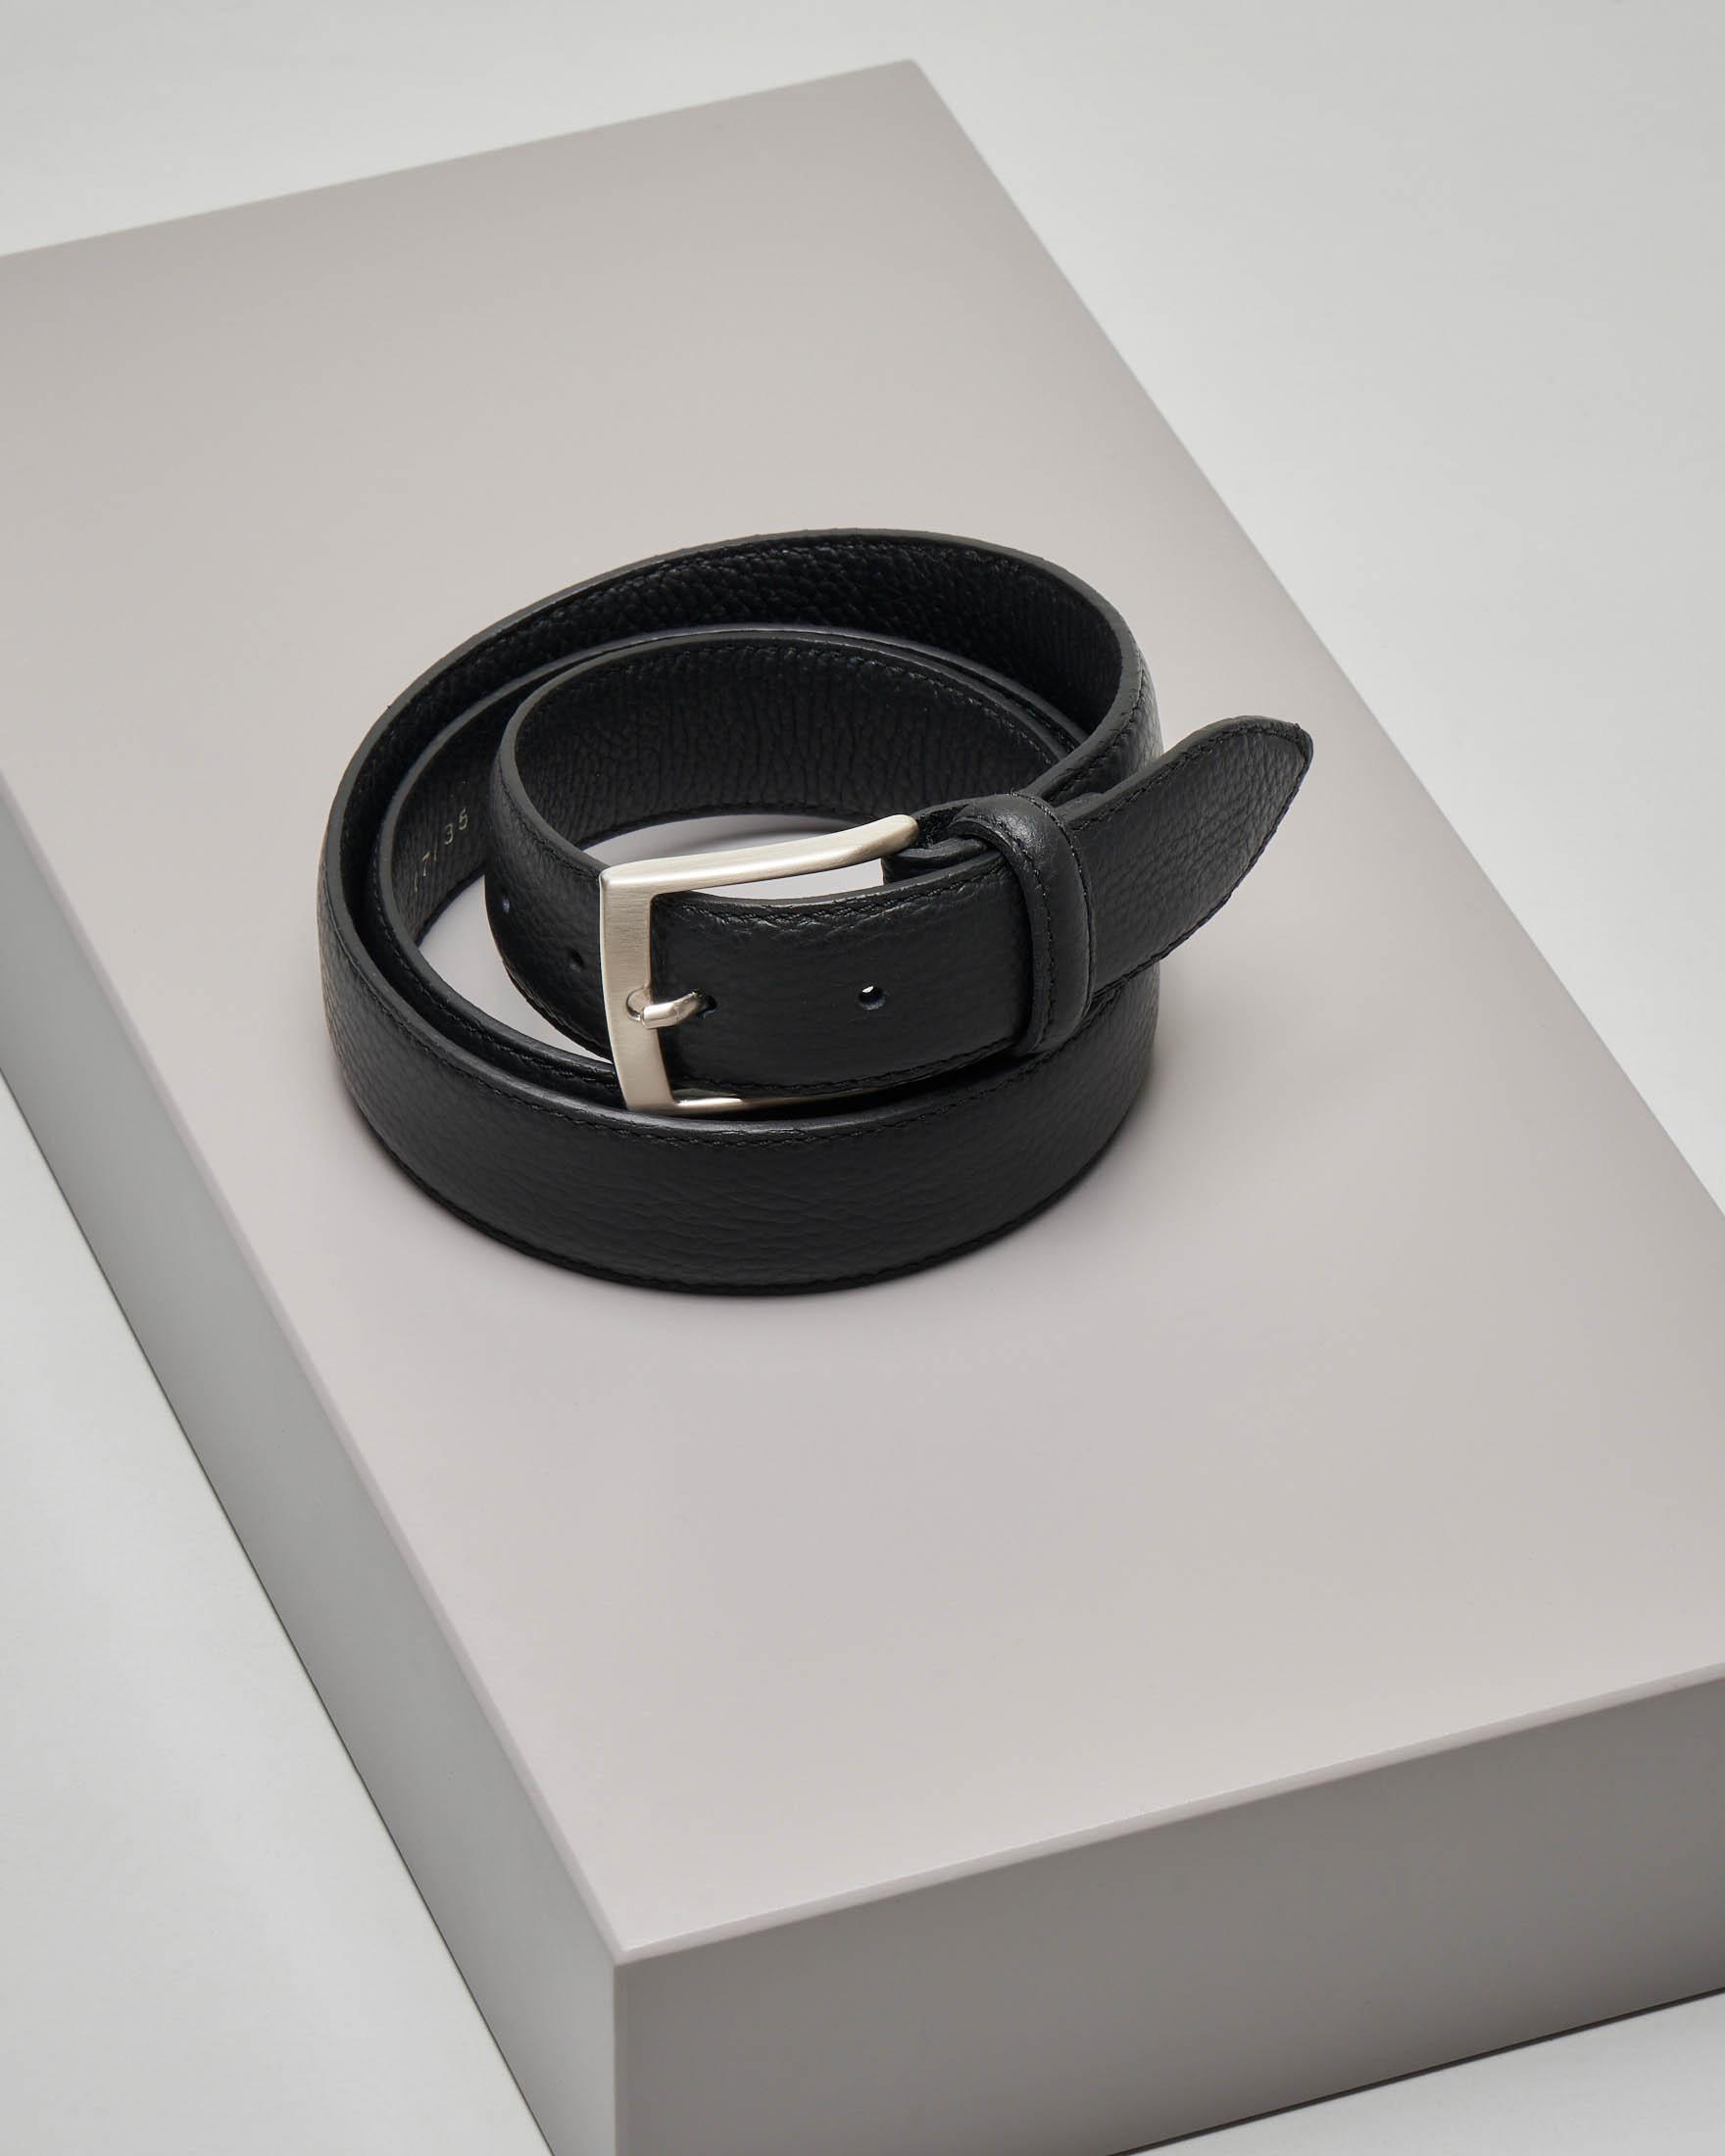 Cintura nera in pelle martellata